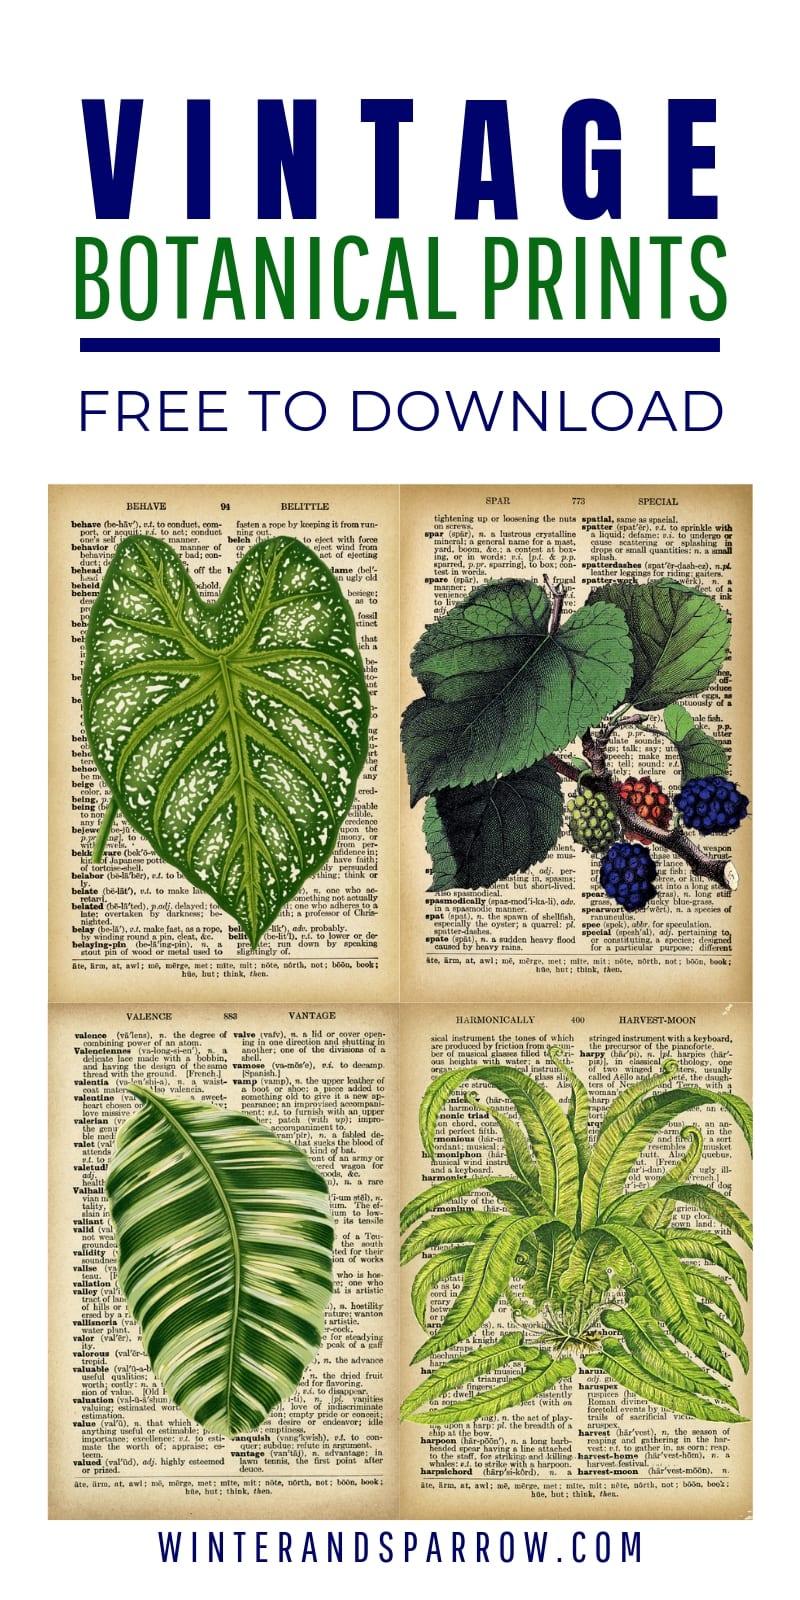 DIY Vintage Botanical Prints {Free Downloads} | winterandsparrow.com #vintagebotanicalprints #freebotanicalprints #vintageprints